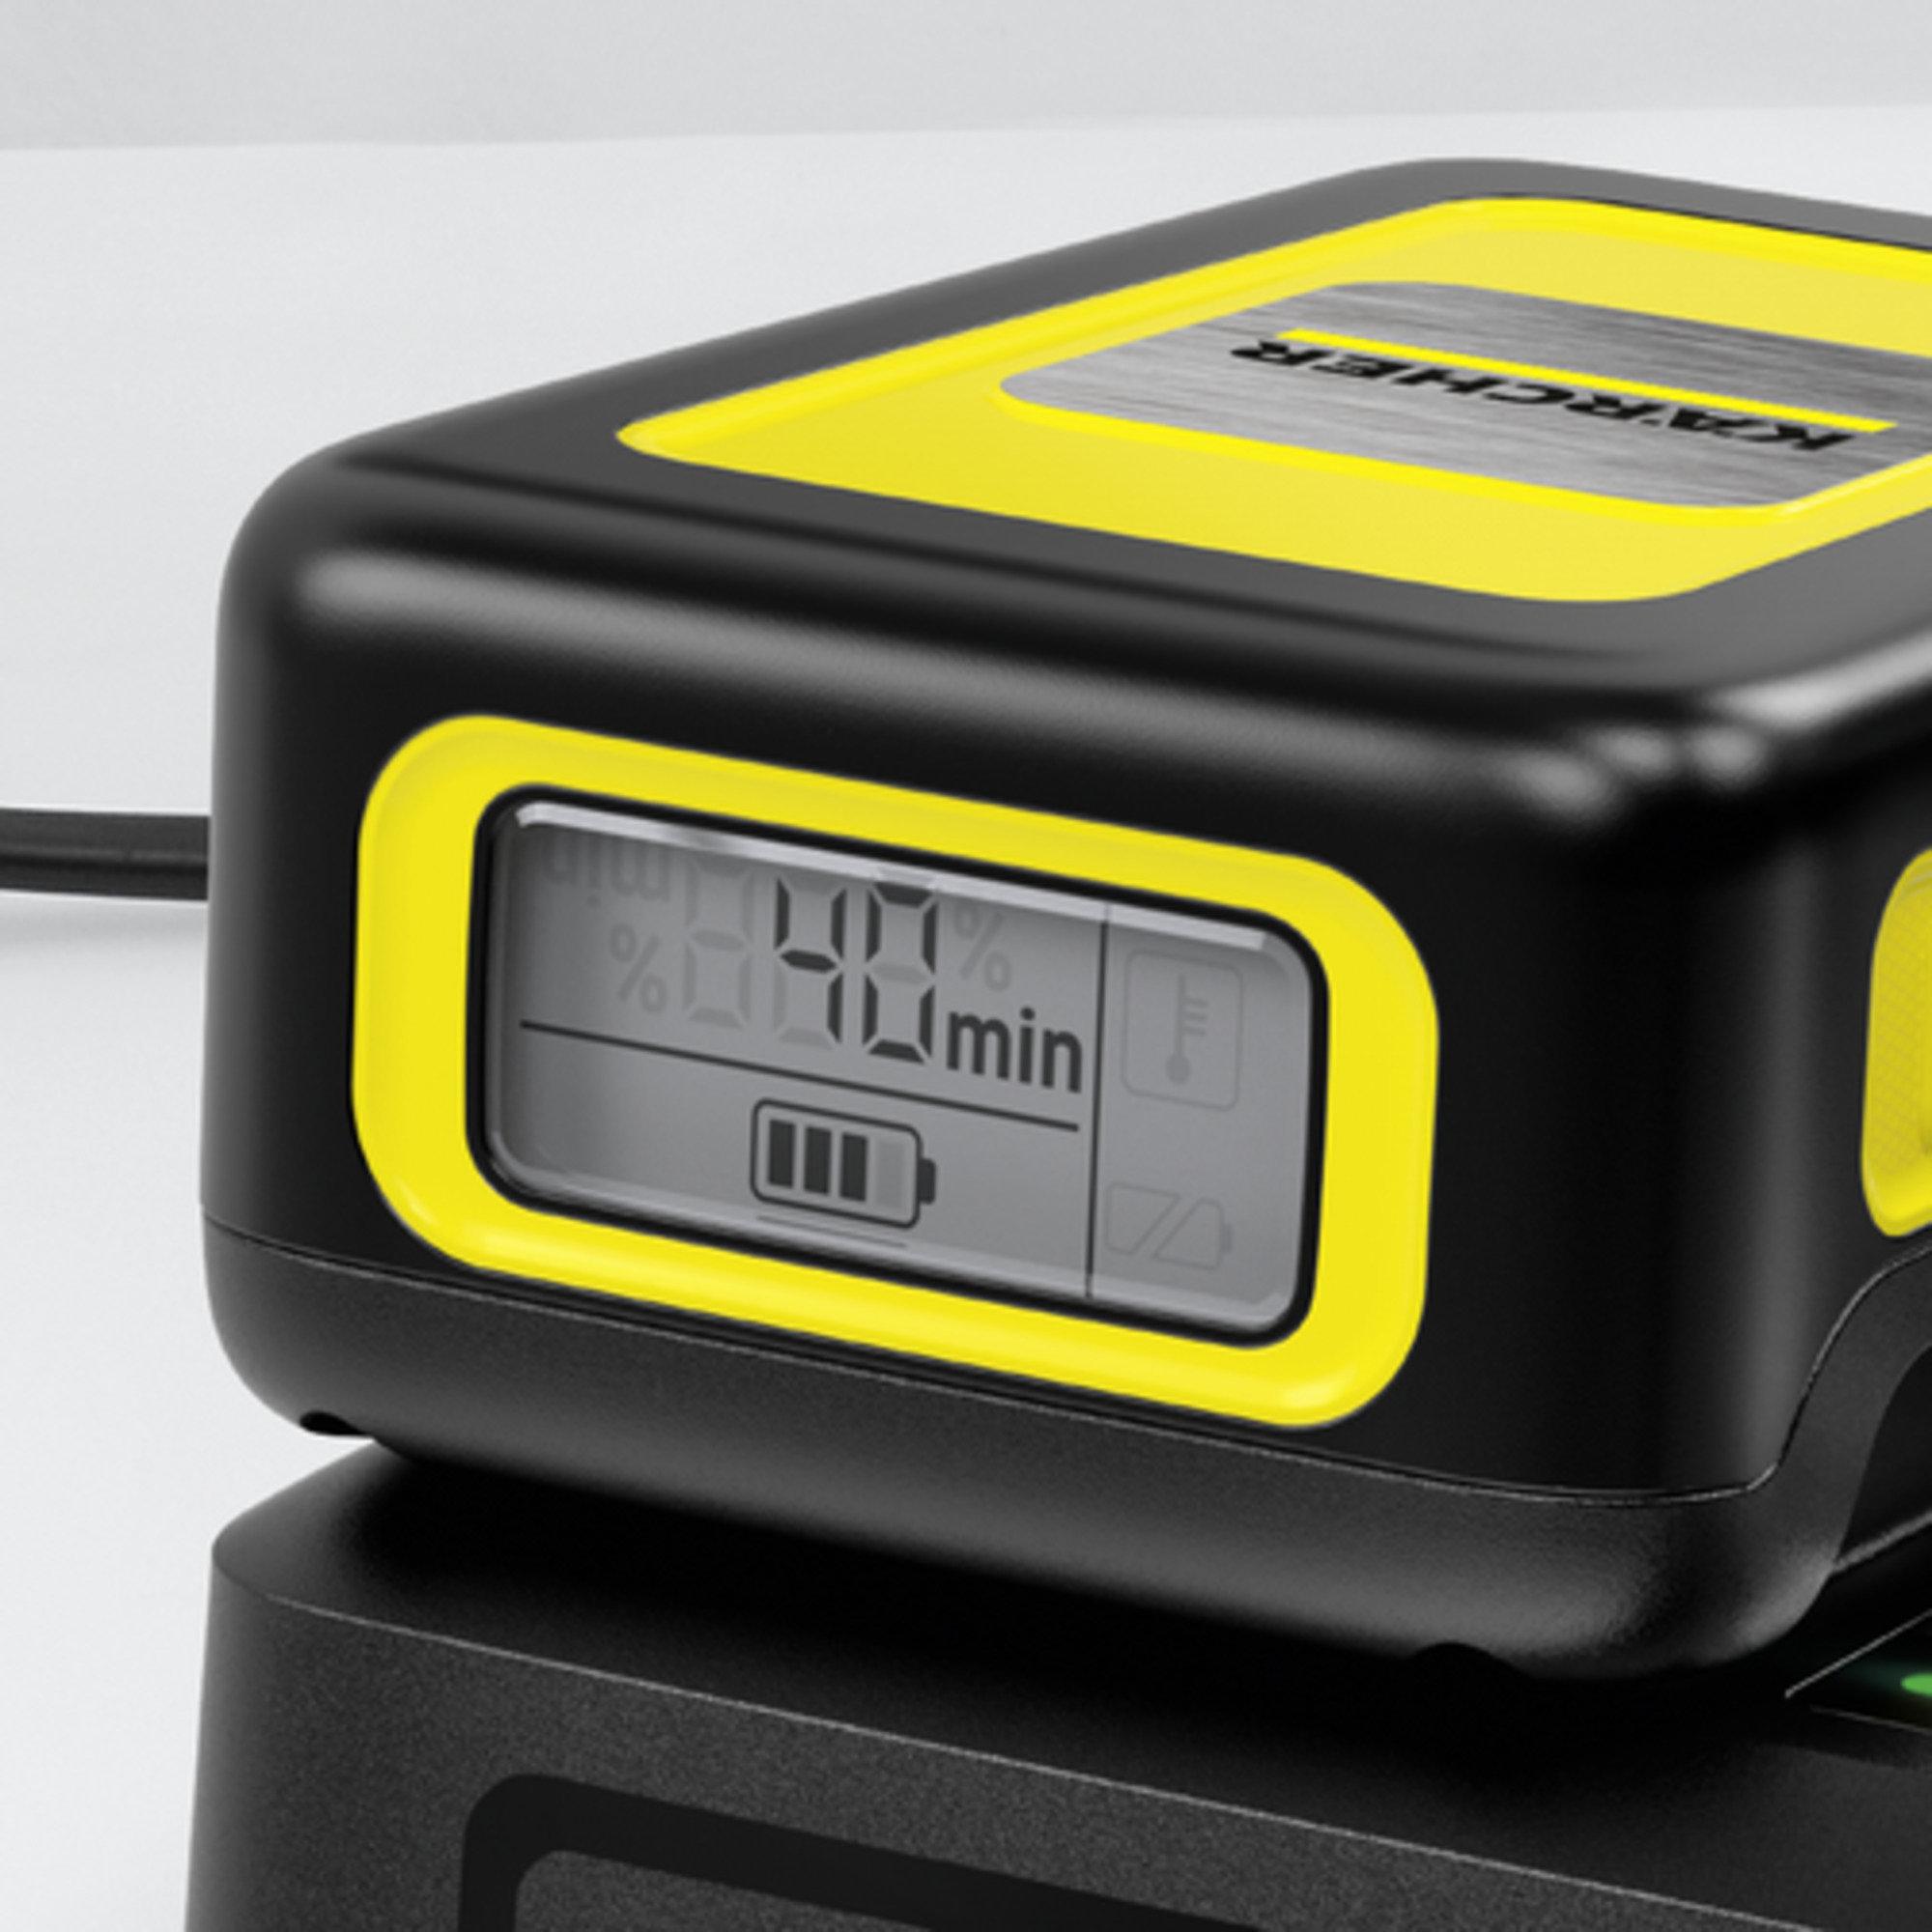 Kiirlaadija Battery Power 18V: Kiirlaadija